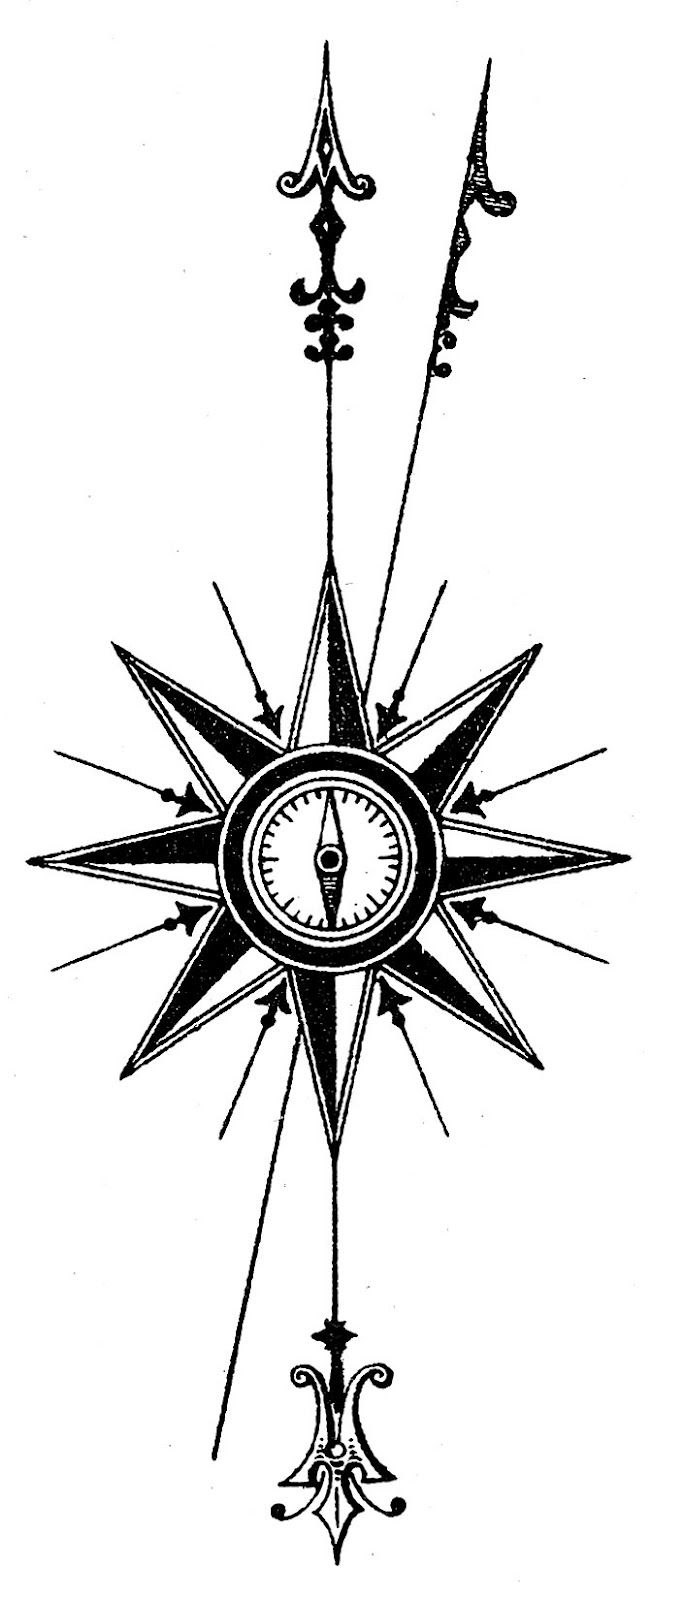 Vintage Steampunk Clip Art - Compass Rose | Compass rose ...